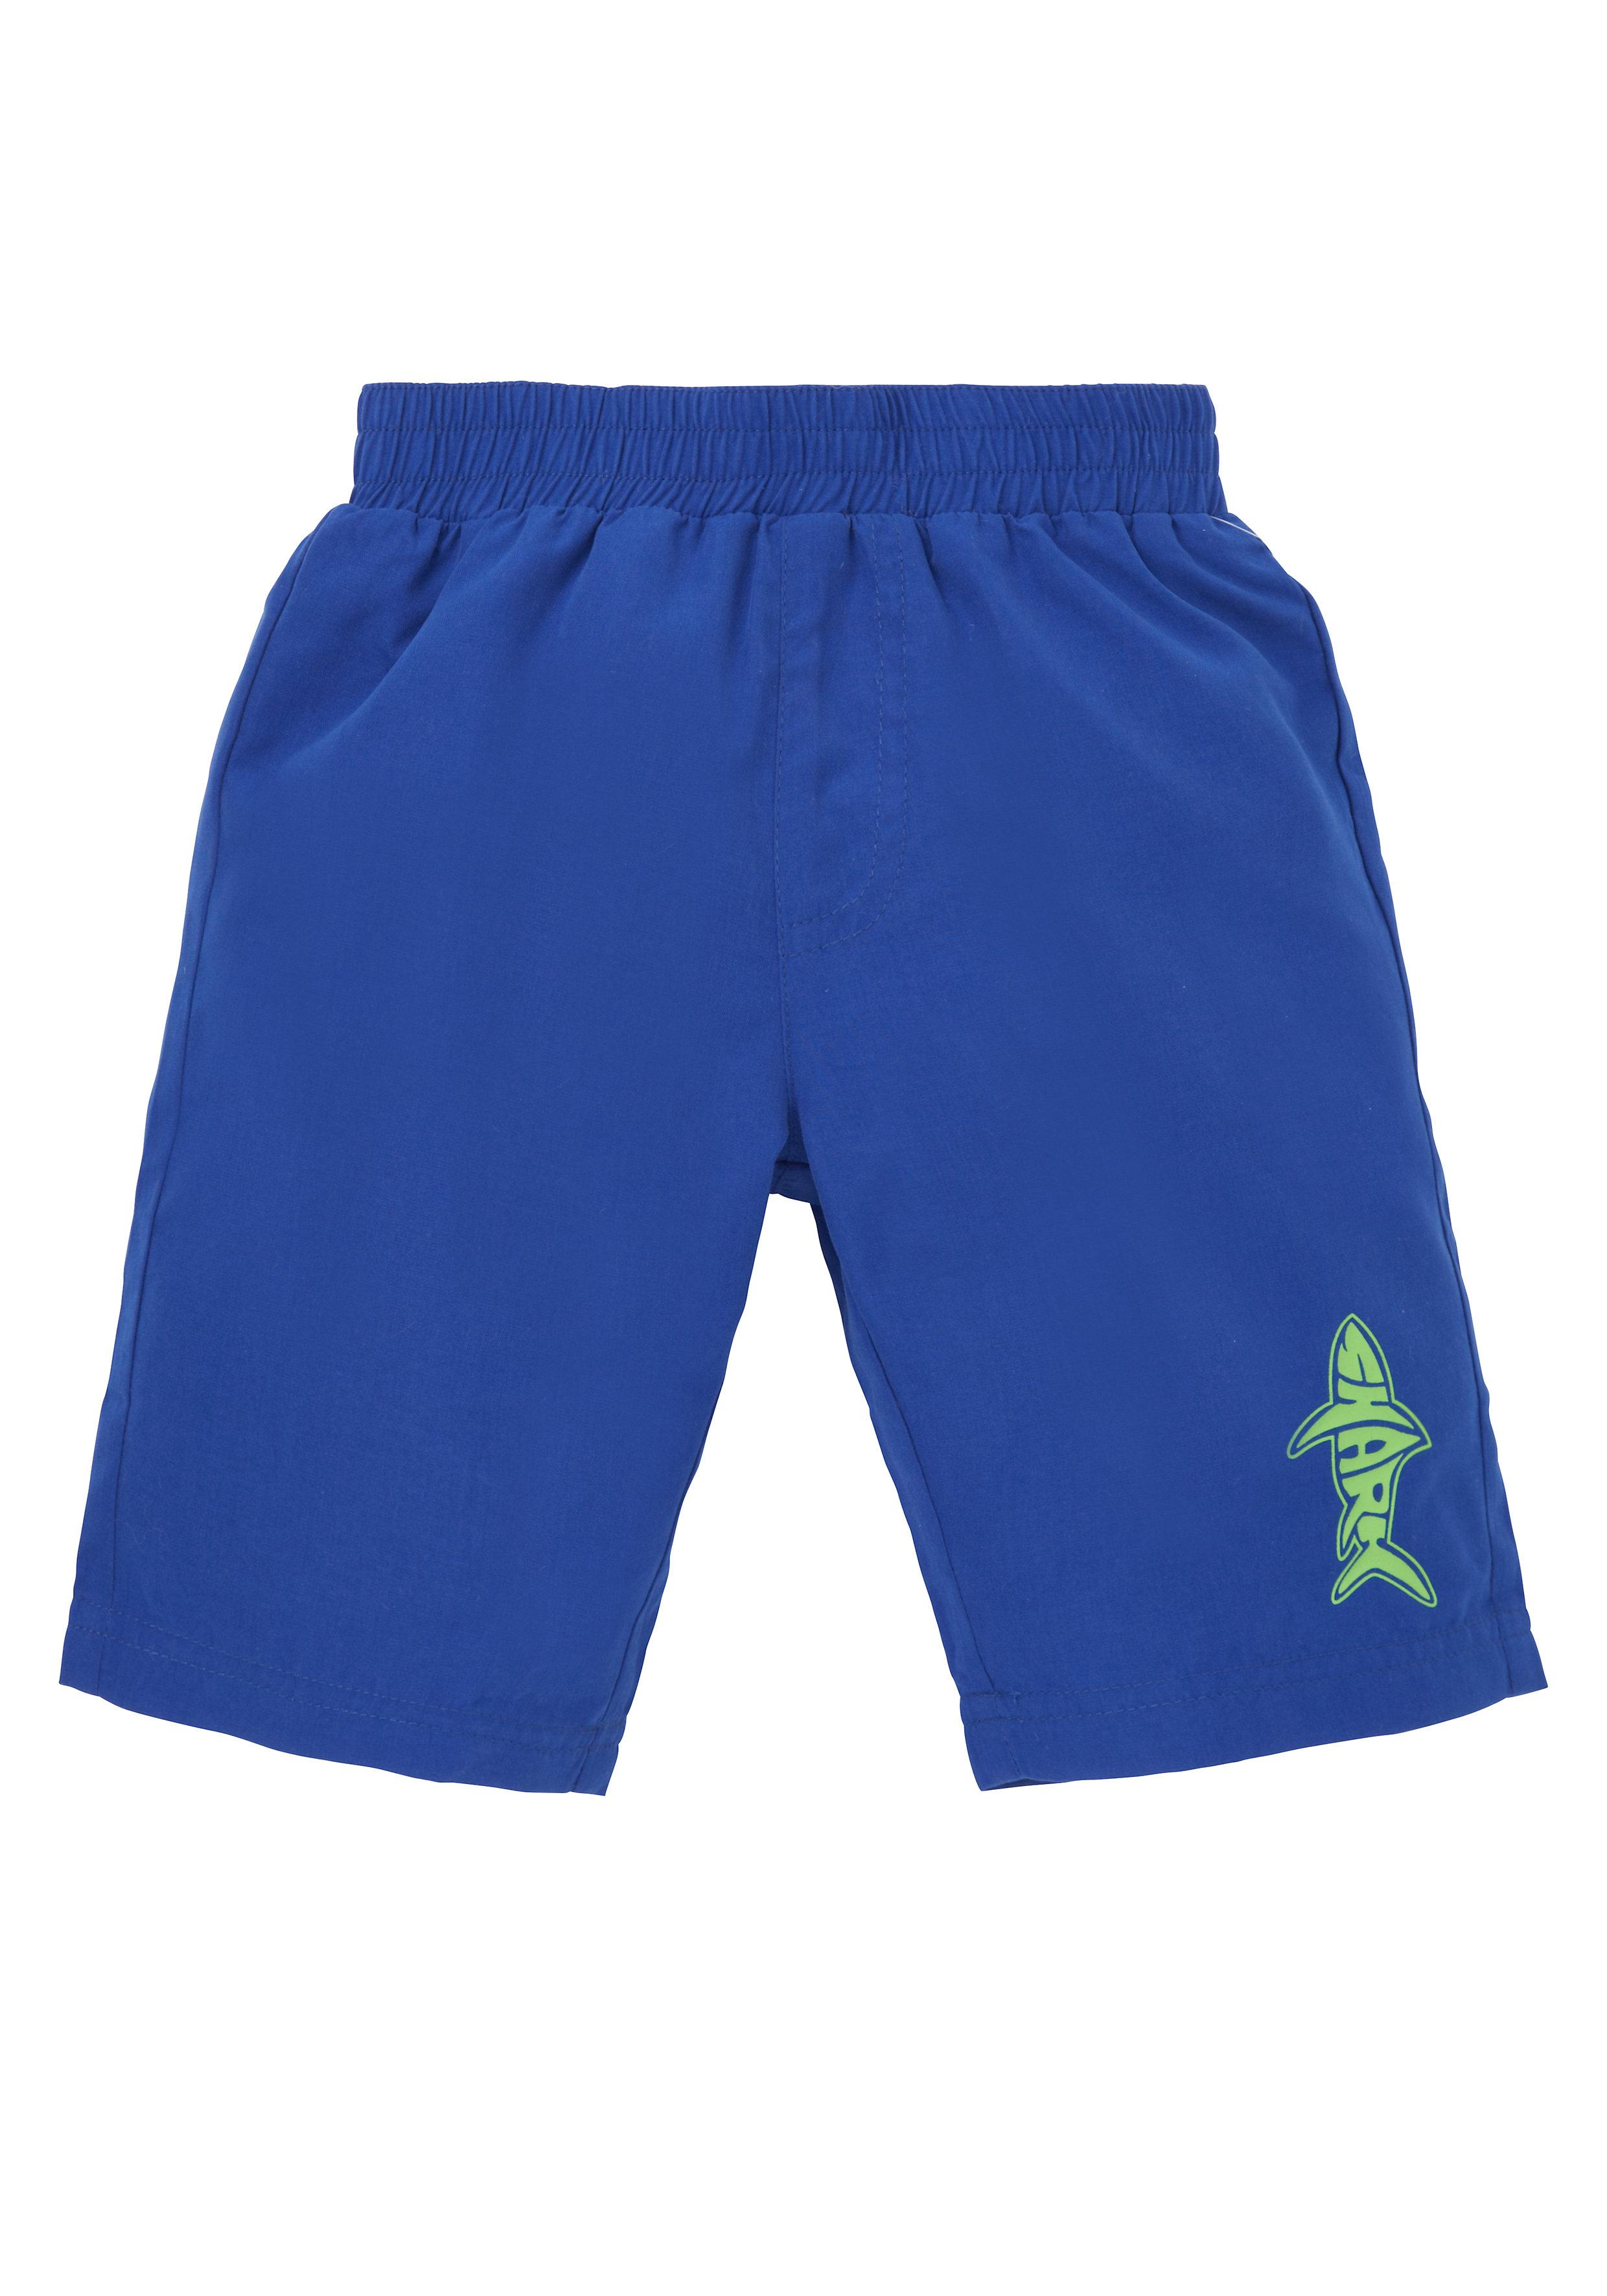 Mothercare | Boys Swimming Shorts Shark Print - Blue